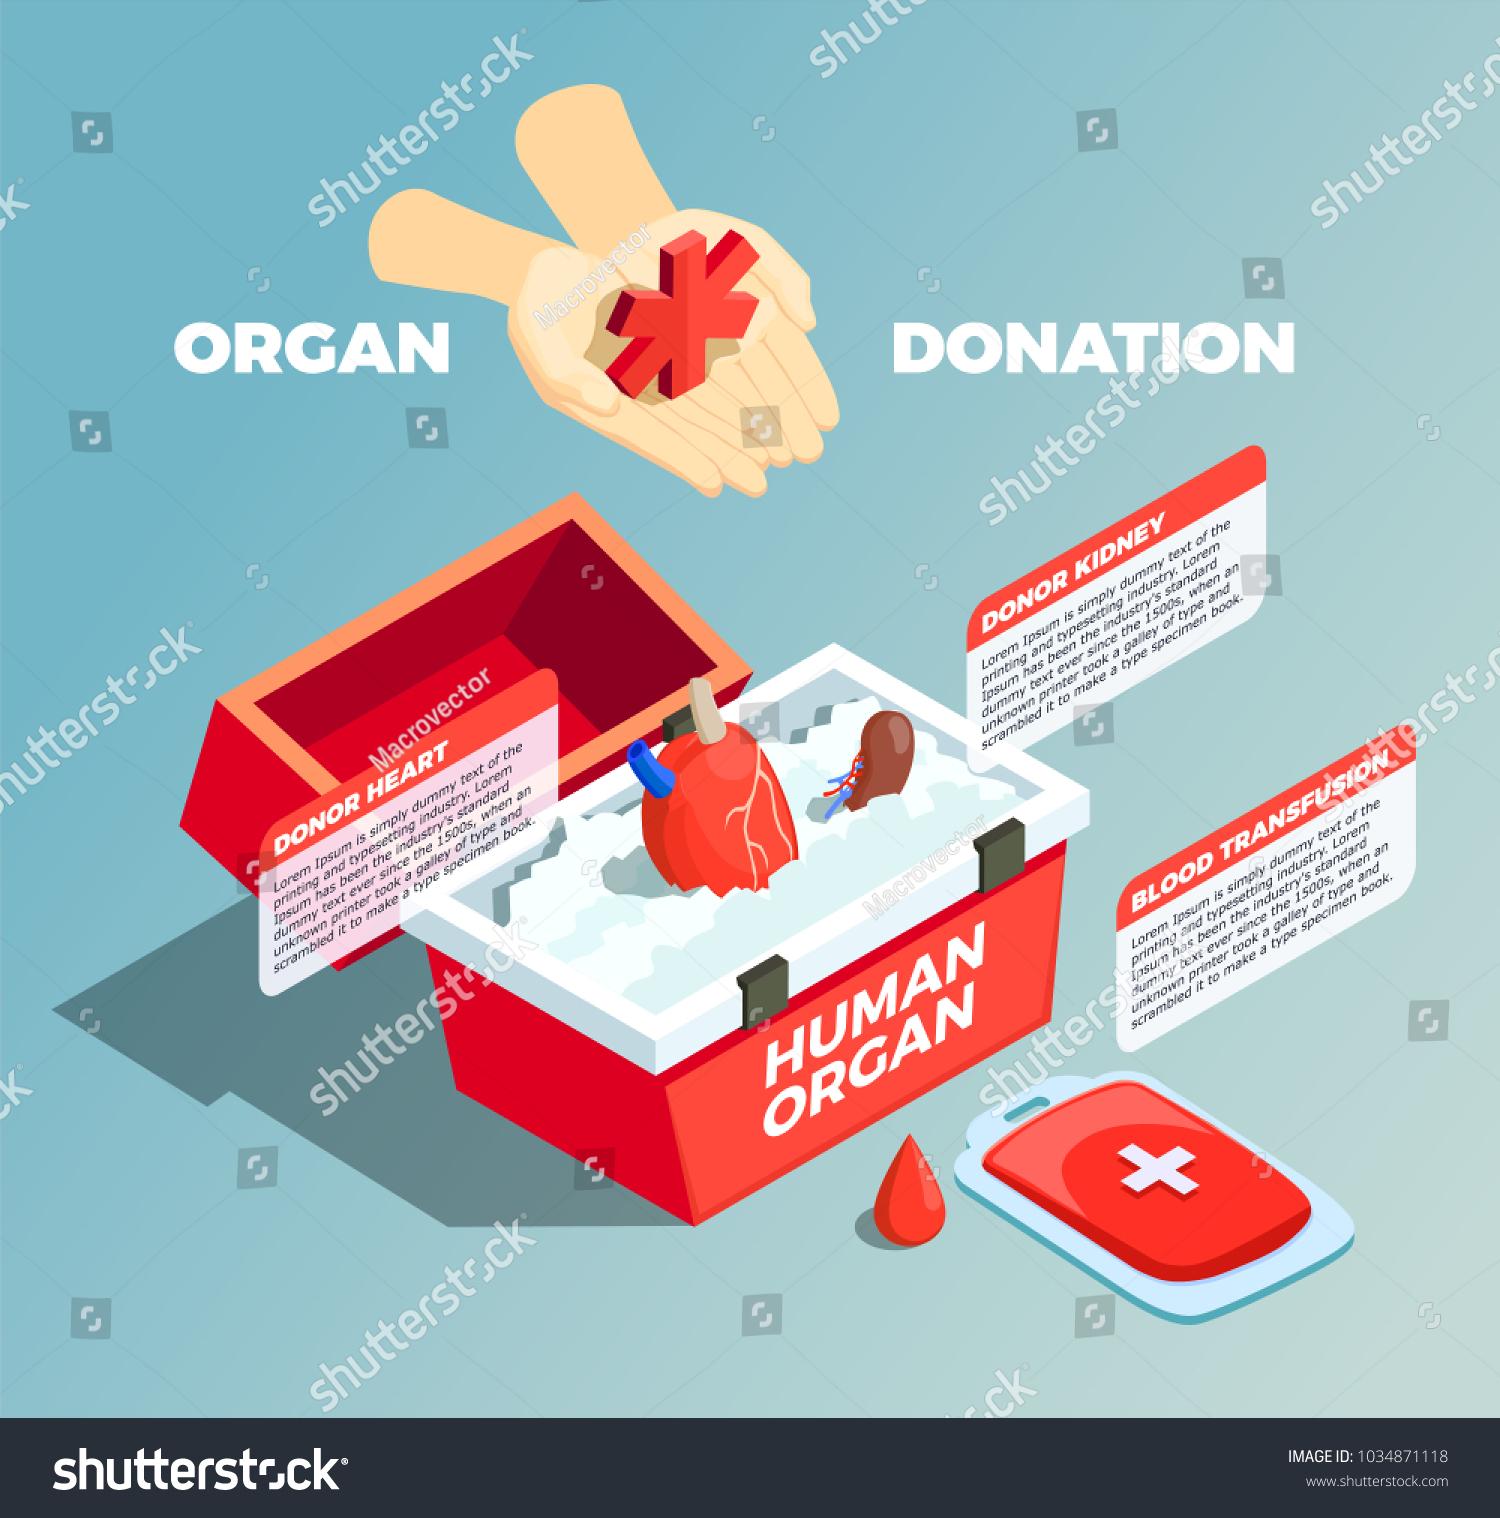 Organ Donation Isometric Composition Donor Kidney Stock Photo (Photo ...